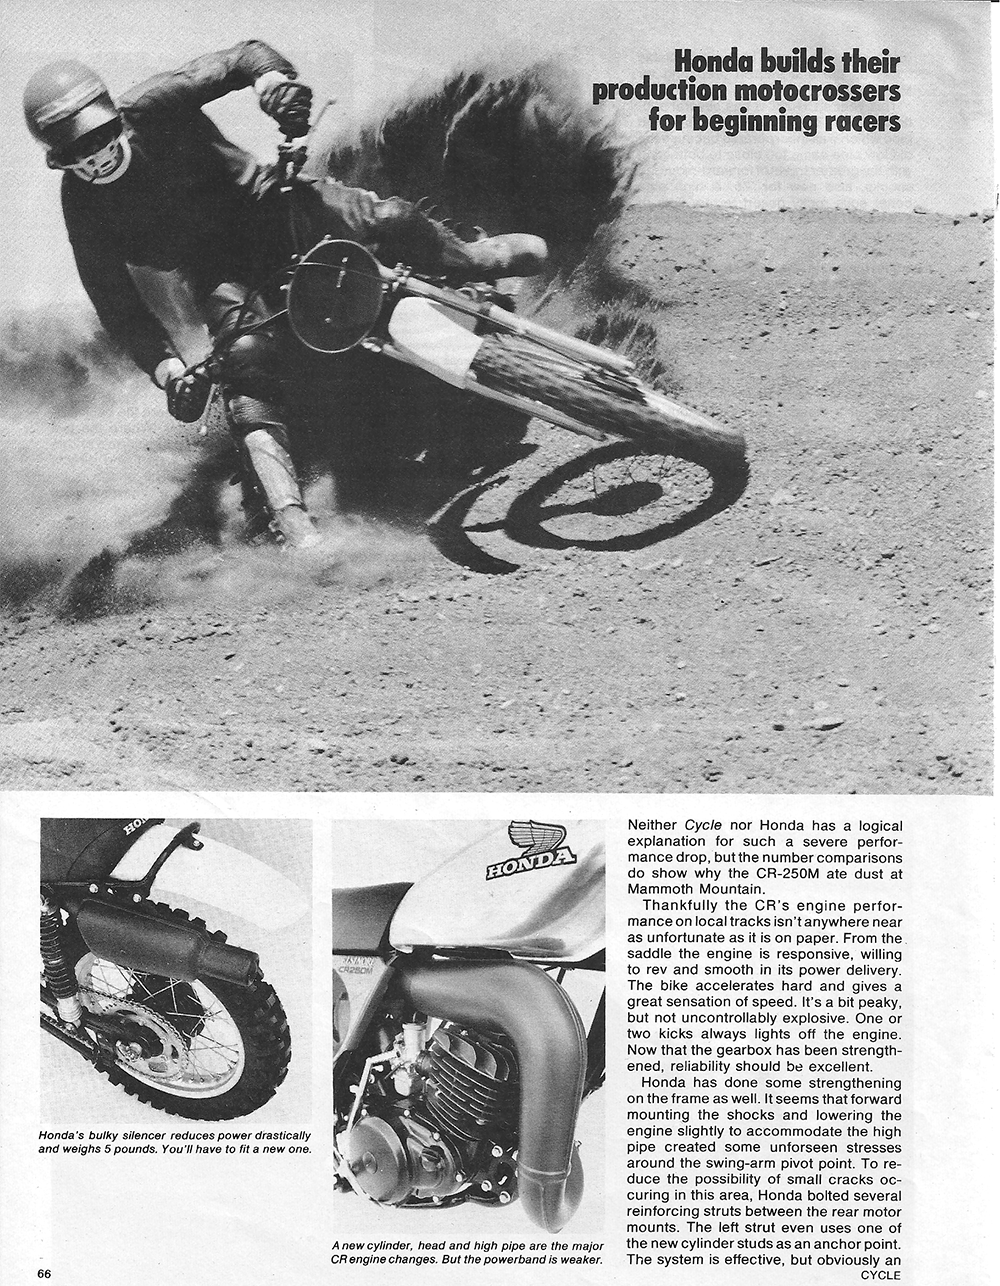 1975 Honda CR250M road test 3.png